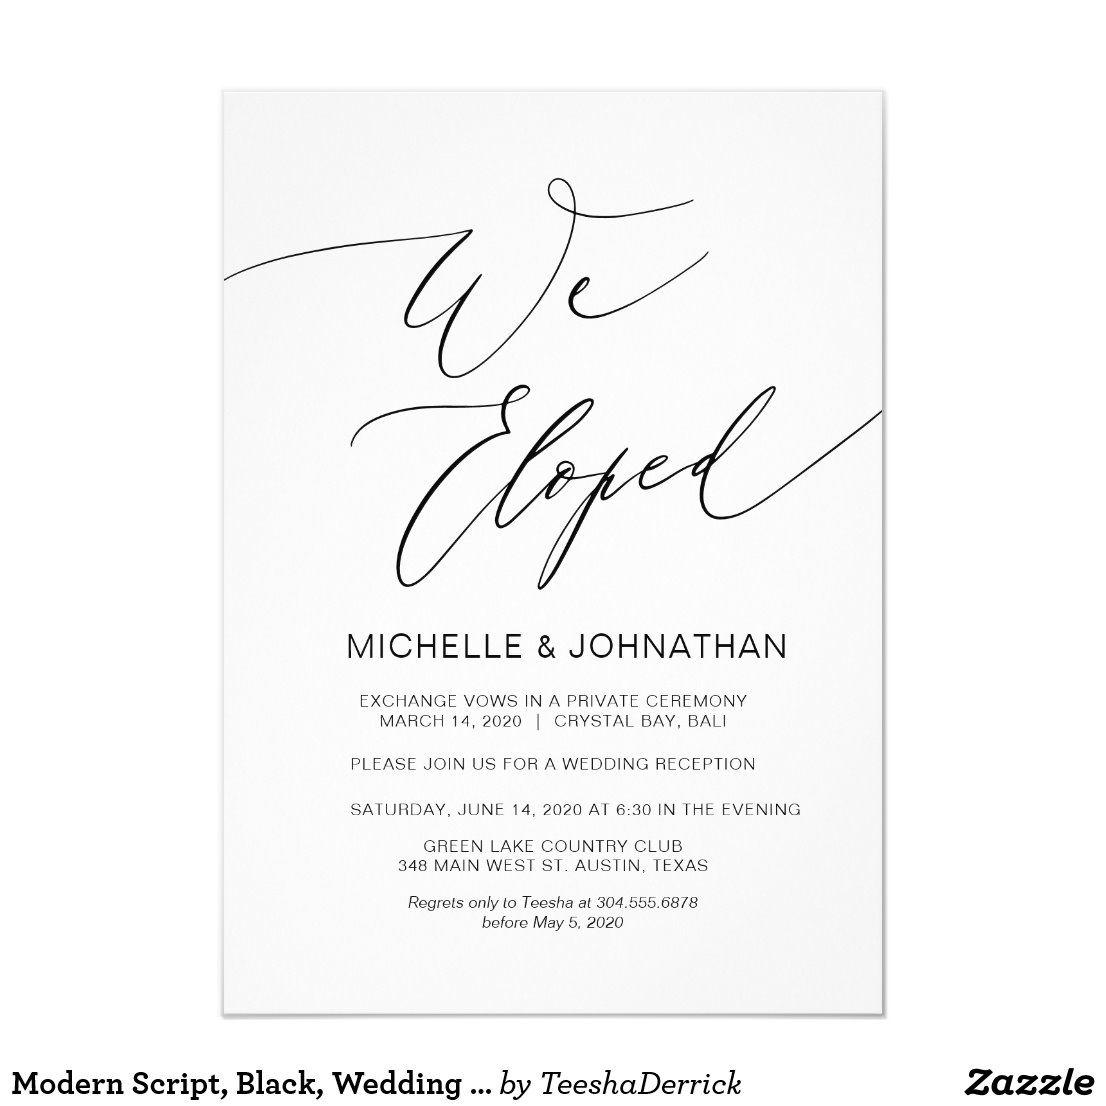 Modern Script, Black, Wedding Elopement Reception